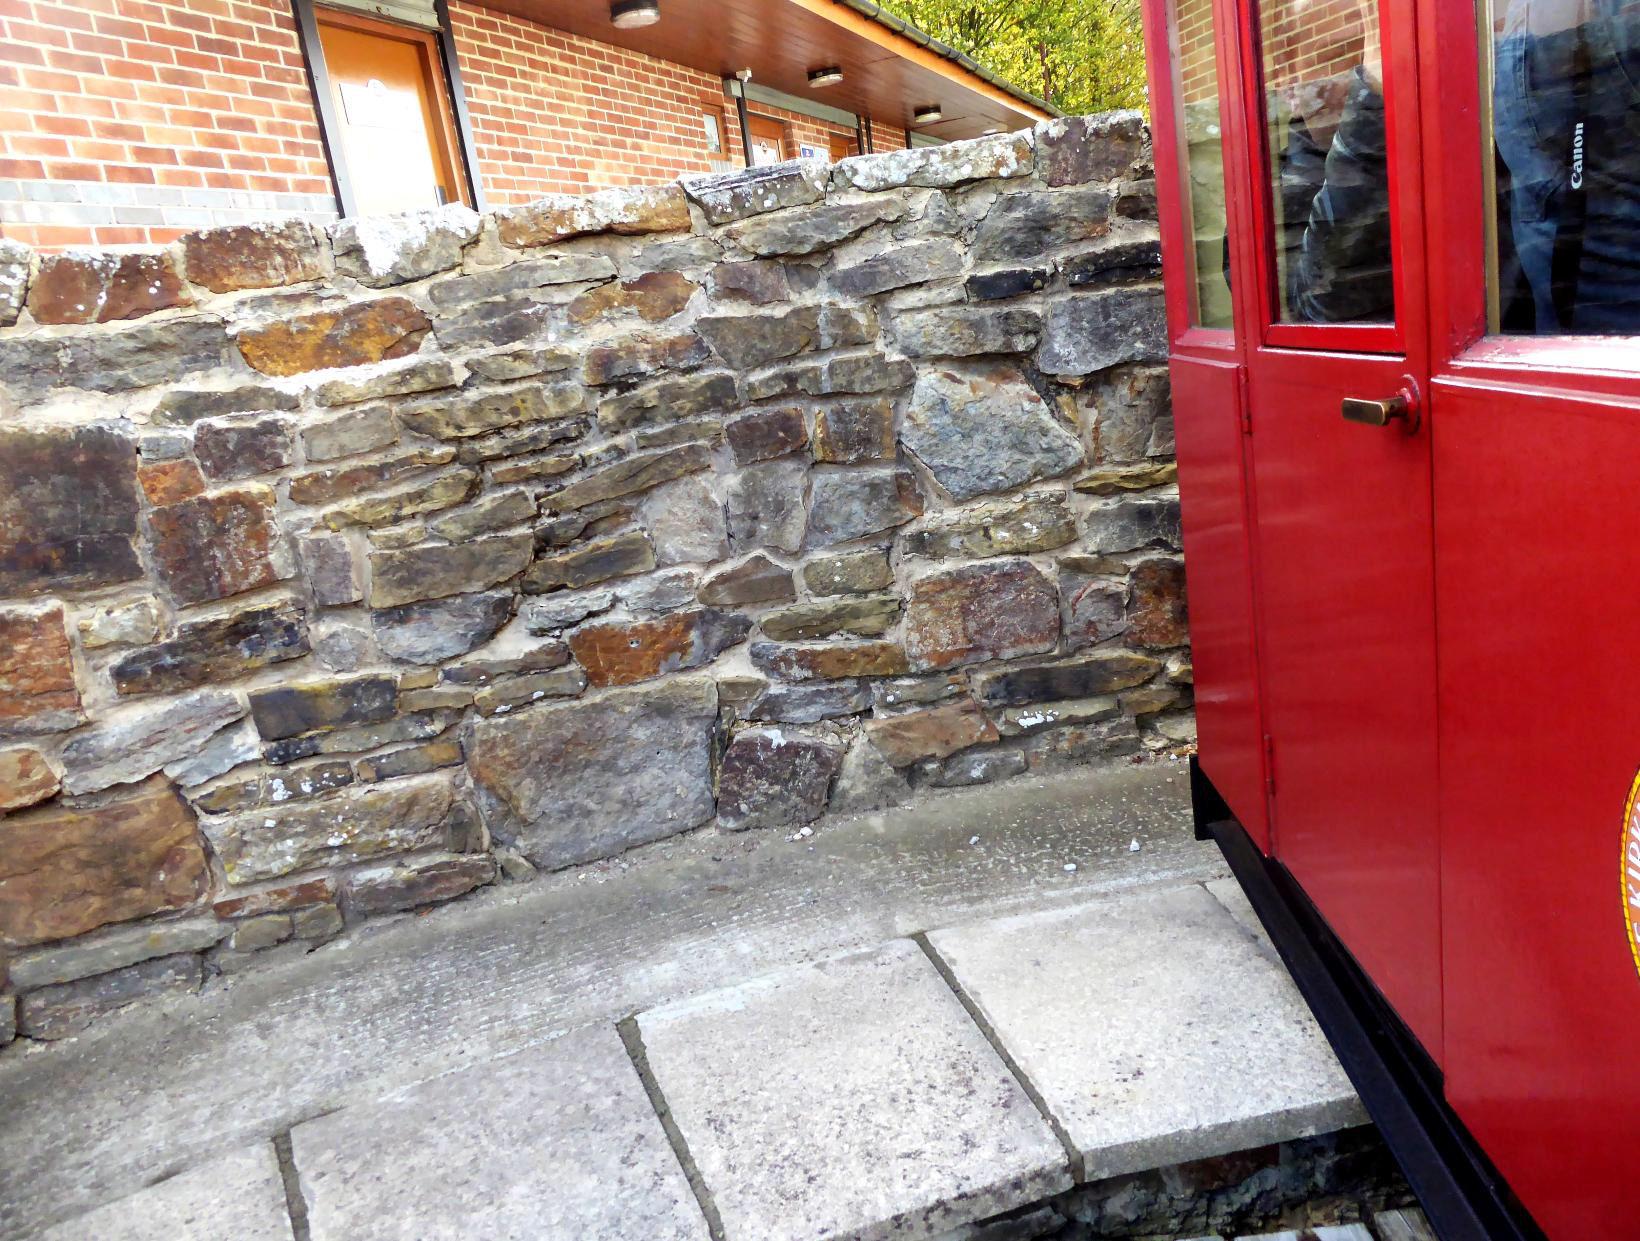 BLS Album - Kirklees Light Railway (KLR) - 26th October 2018